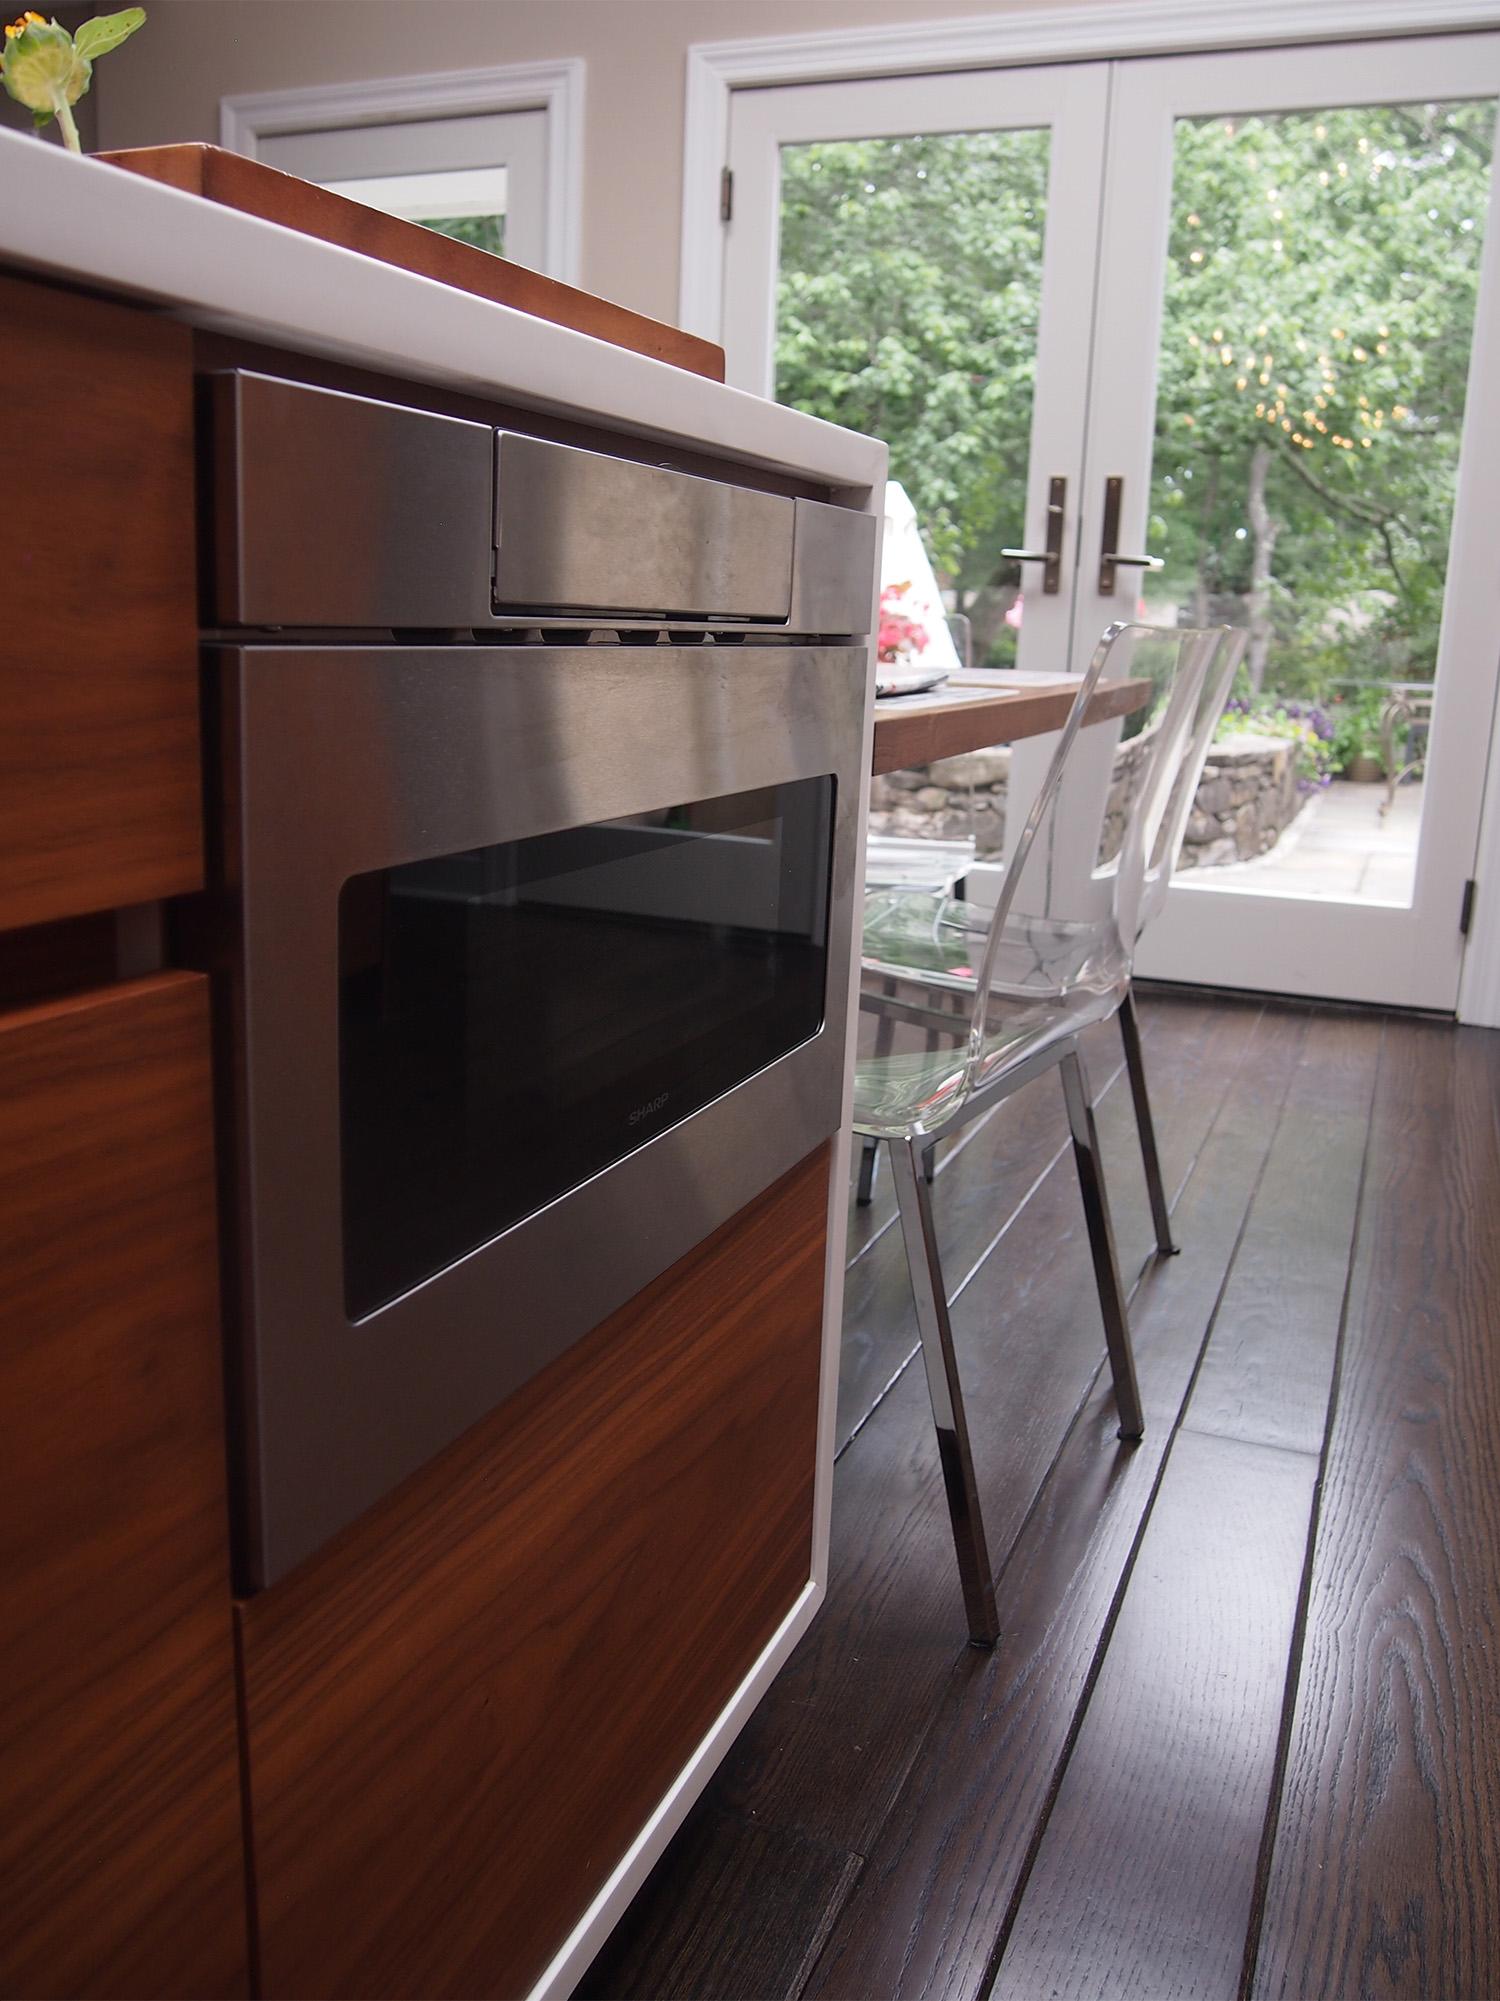 P1010503 oven web.jpg